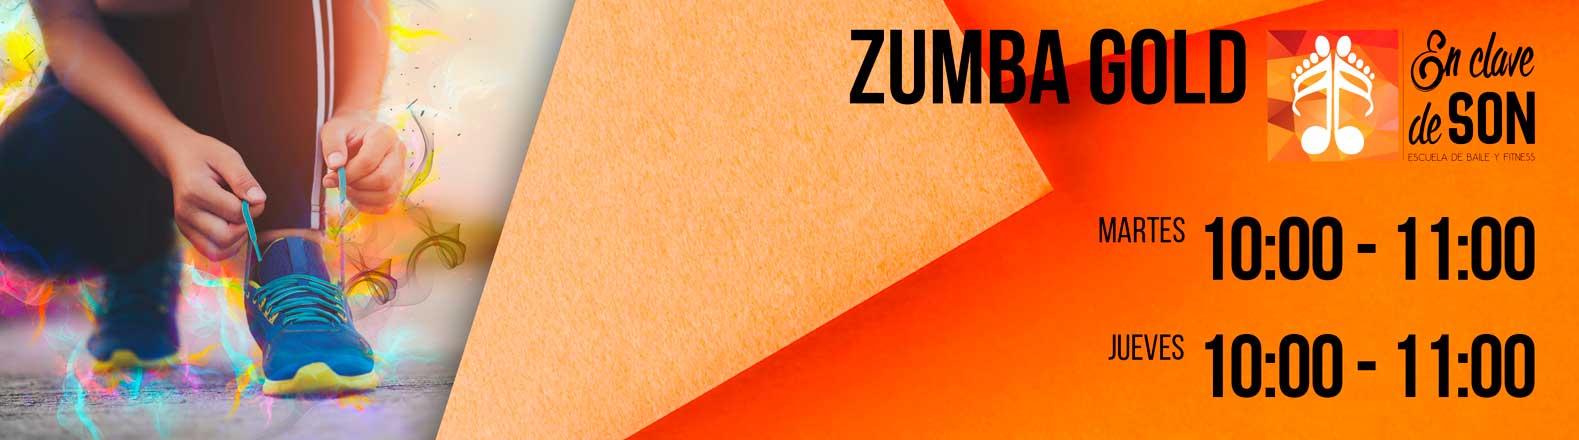 Zumba Pamplona